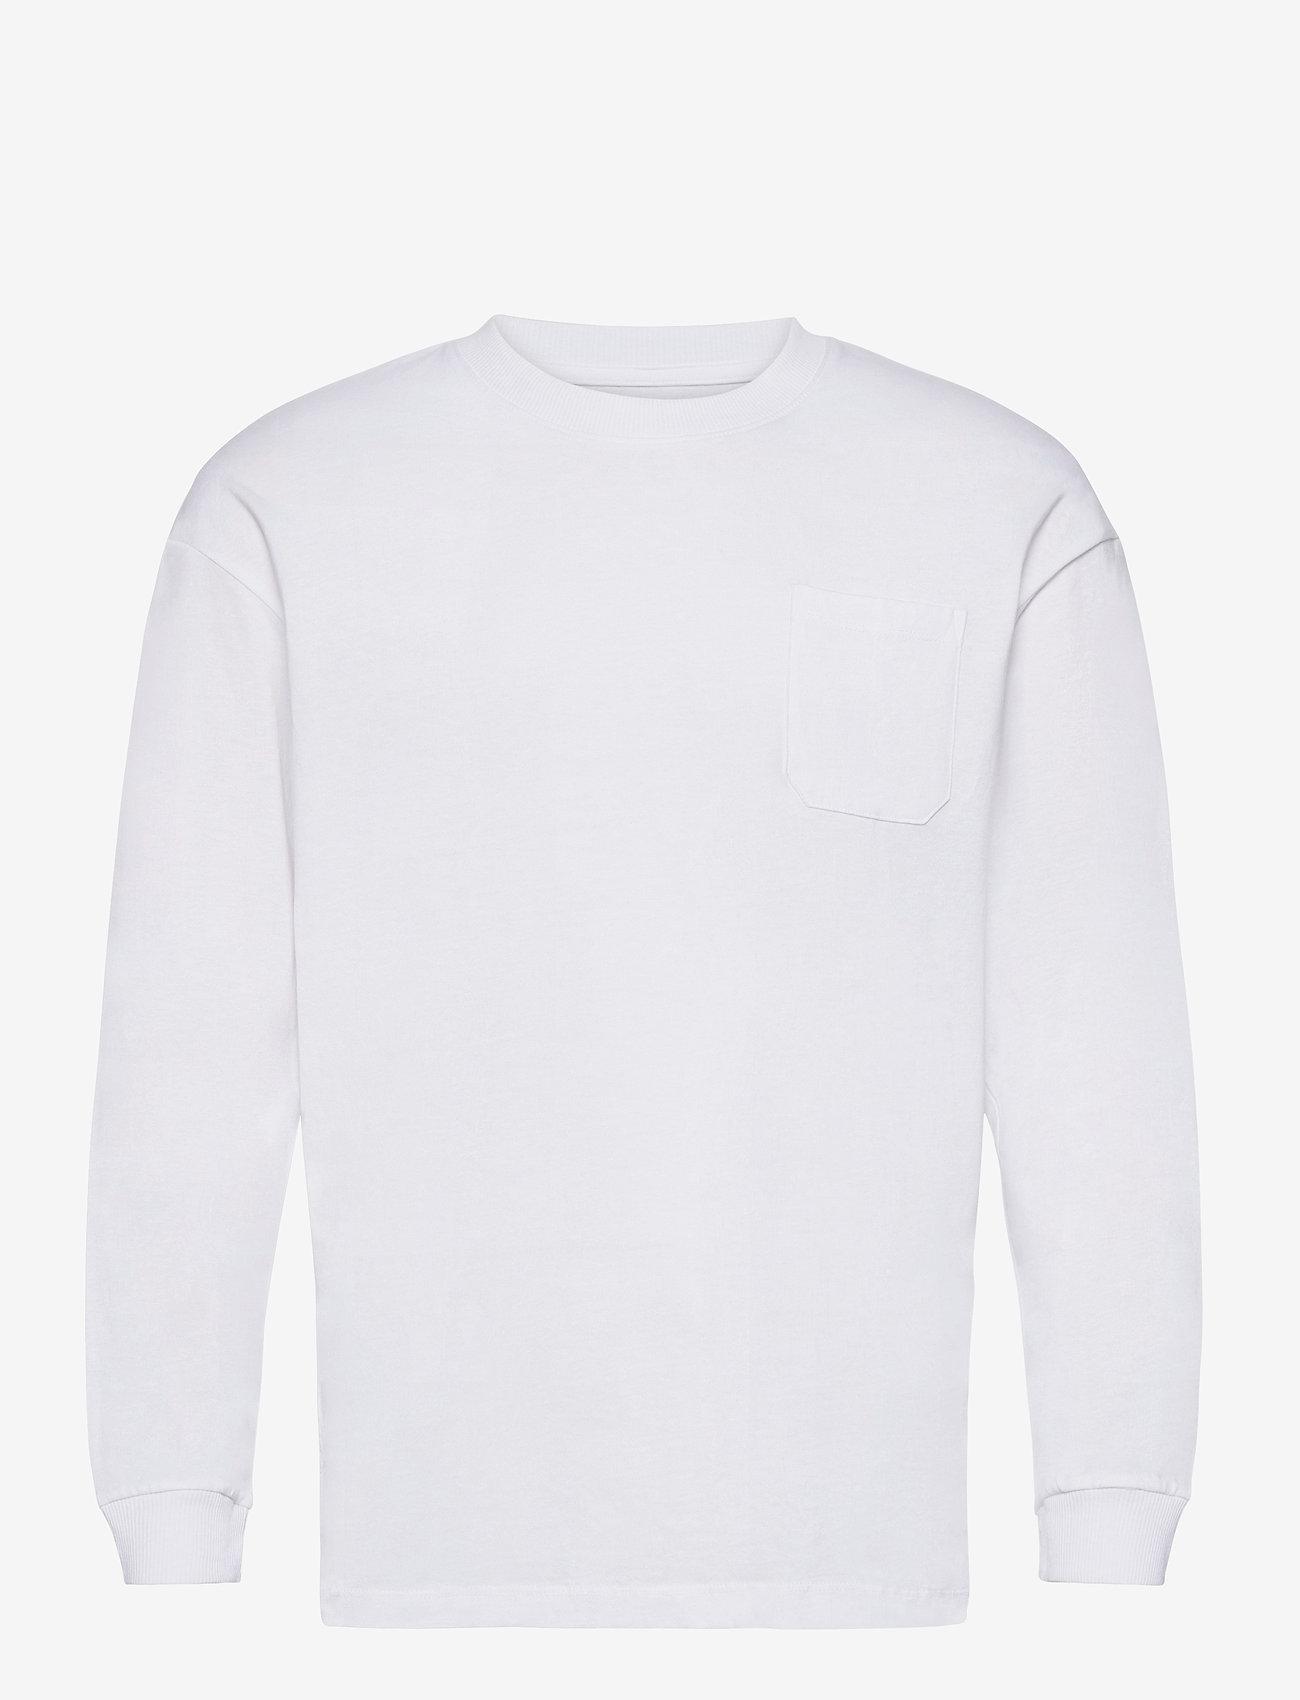 Jack & Jones - JORBRINK TEE LS CREW NECK - basic t-shirts - white - 0